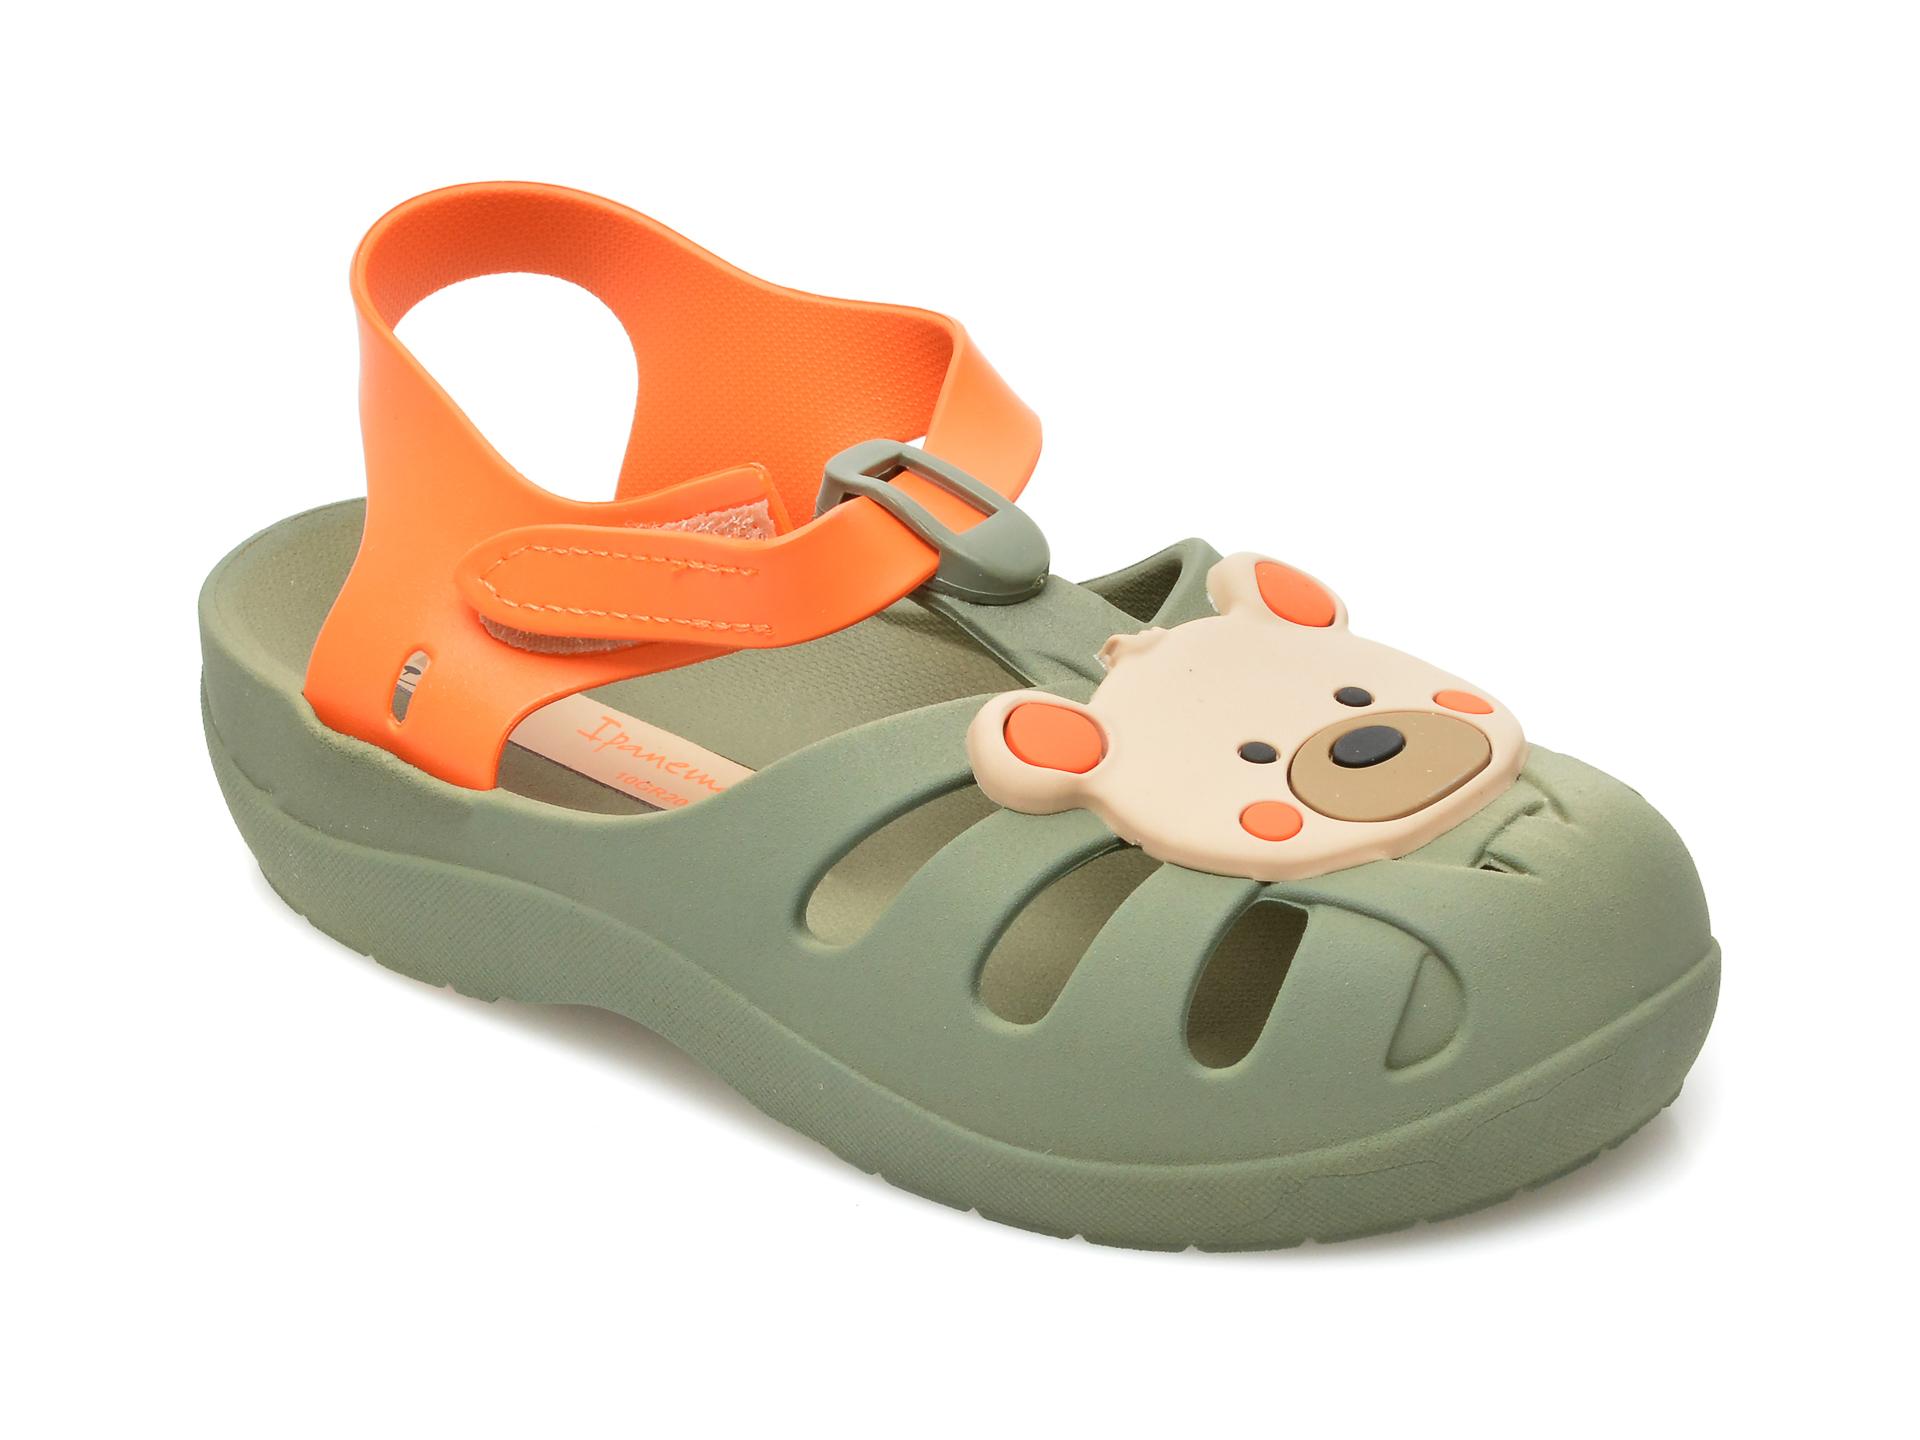 Sandale IPANEMA verzi, 8307489, din pvc